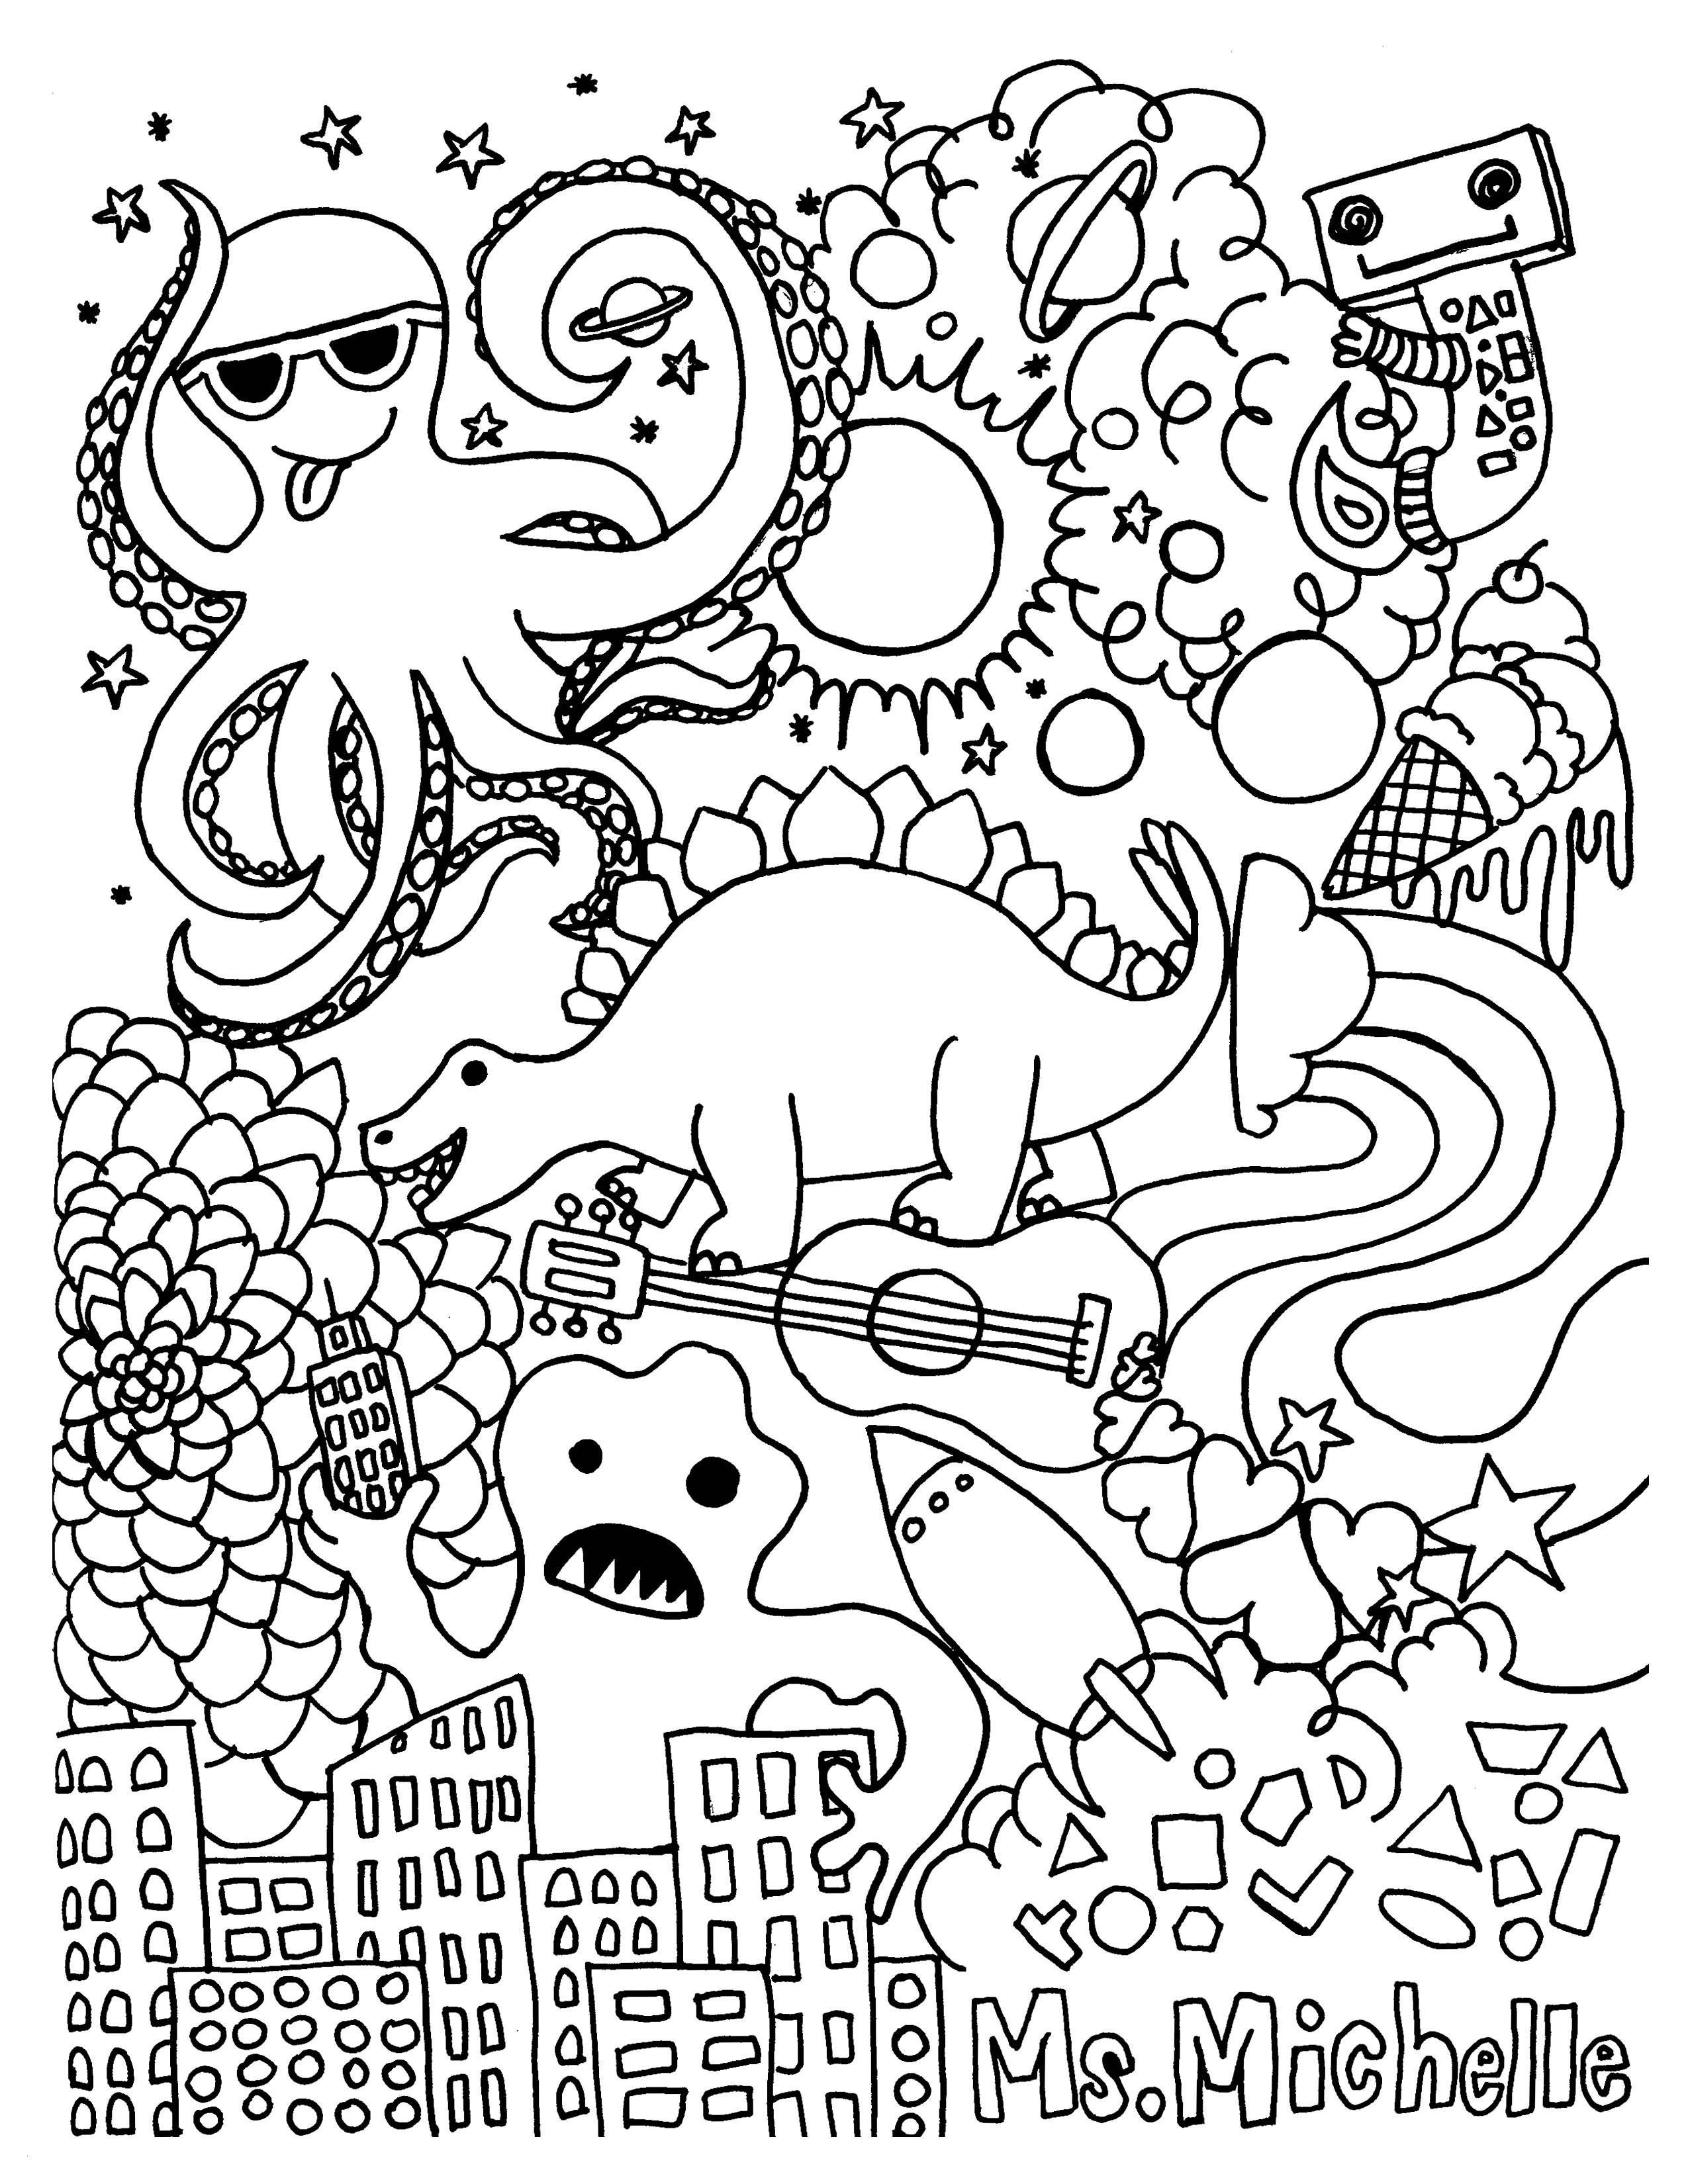 Ausmalbilder Monster High Neu Coloring & Crafts Delightful Color Monster High as 35 Malvorlagen Galerie